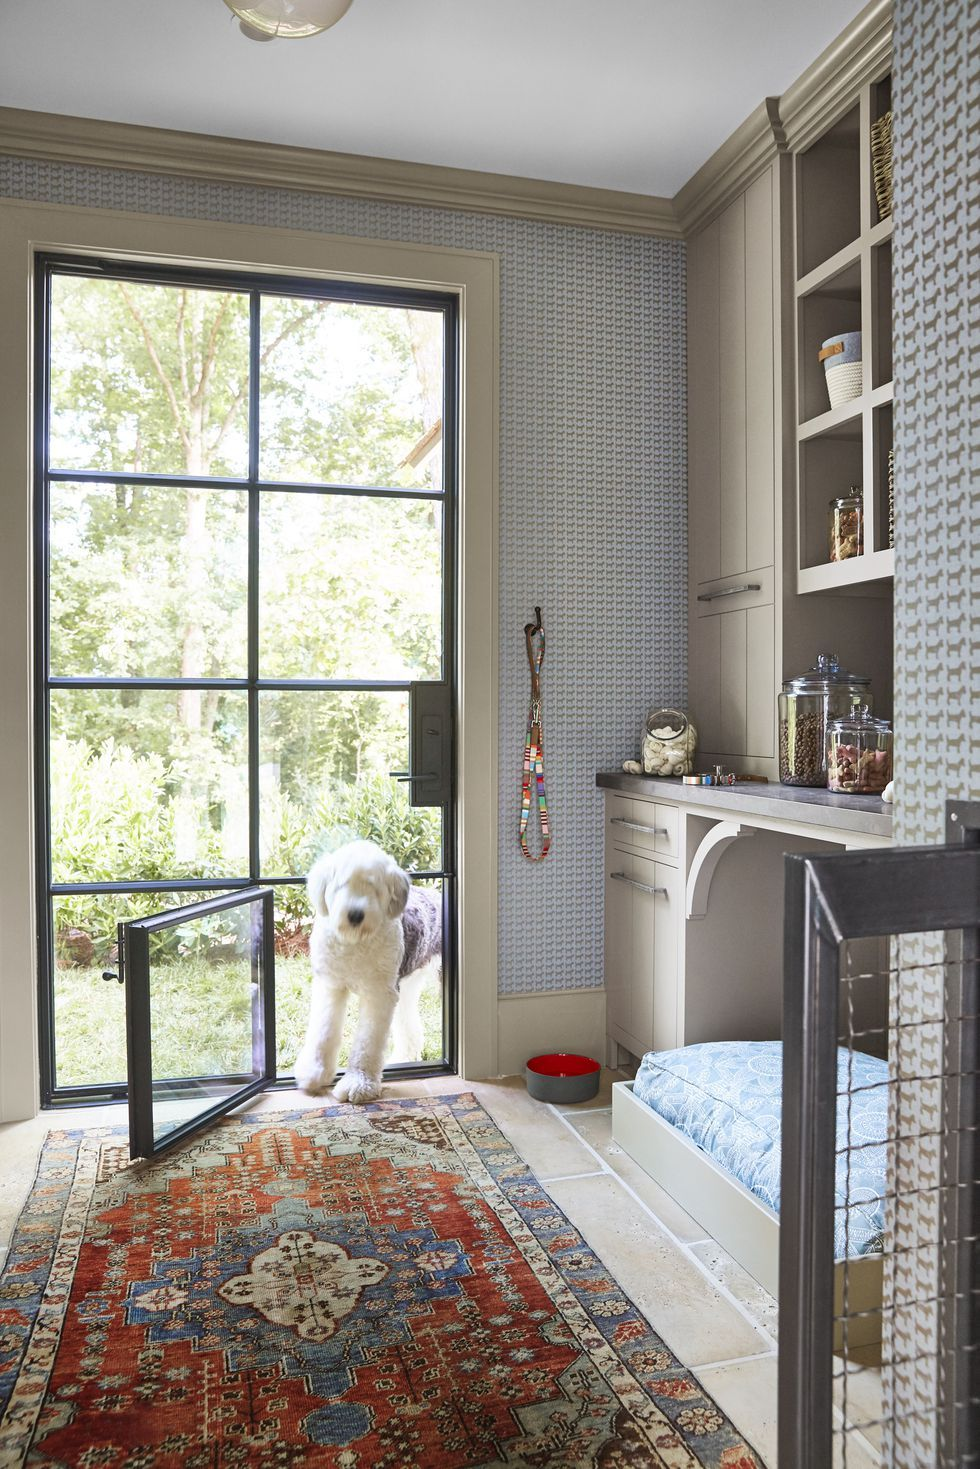 Dream Home Needs A Doggy Room